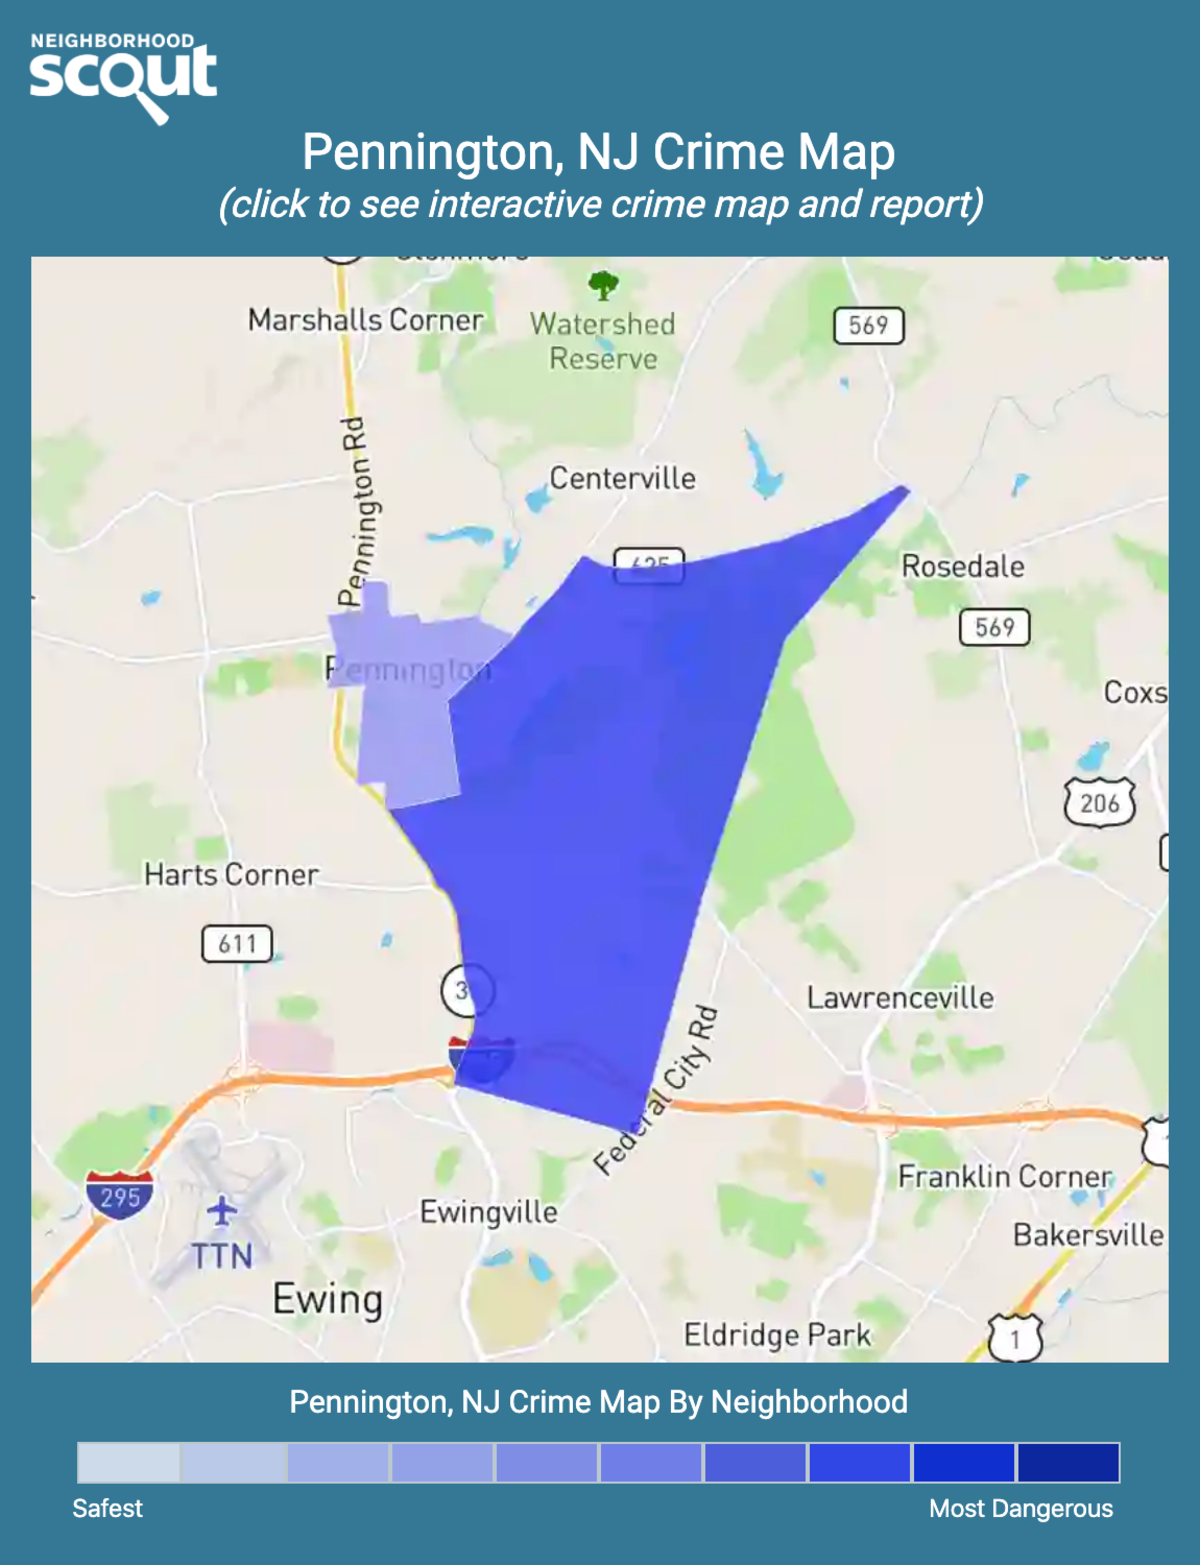 Pennington, New Jersey crime map